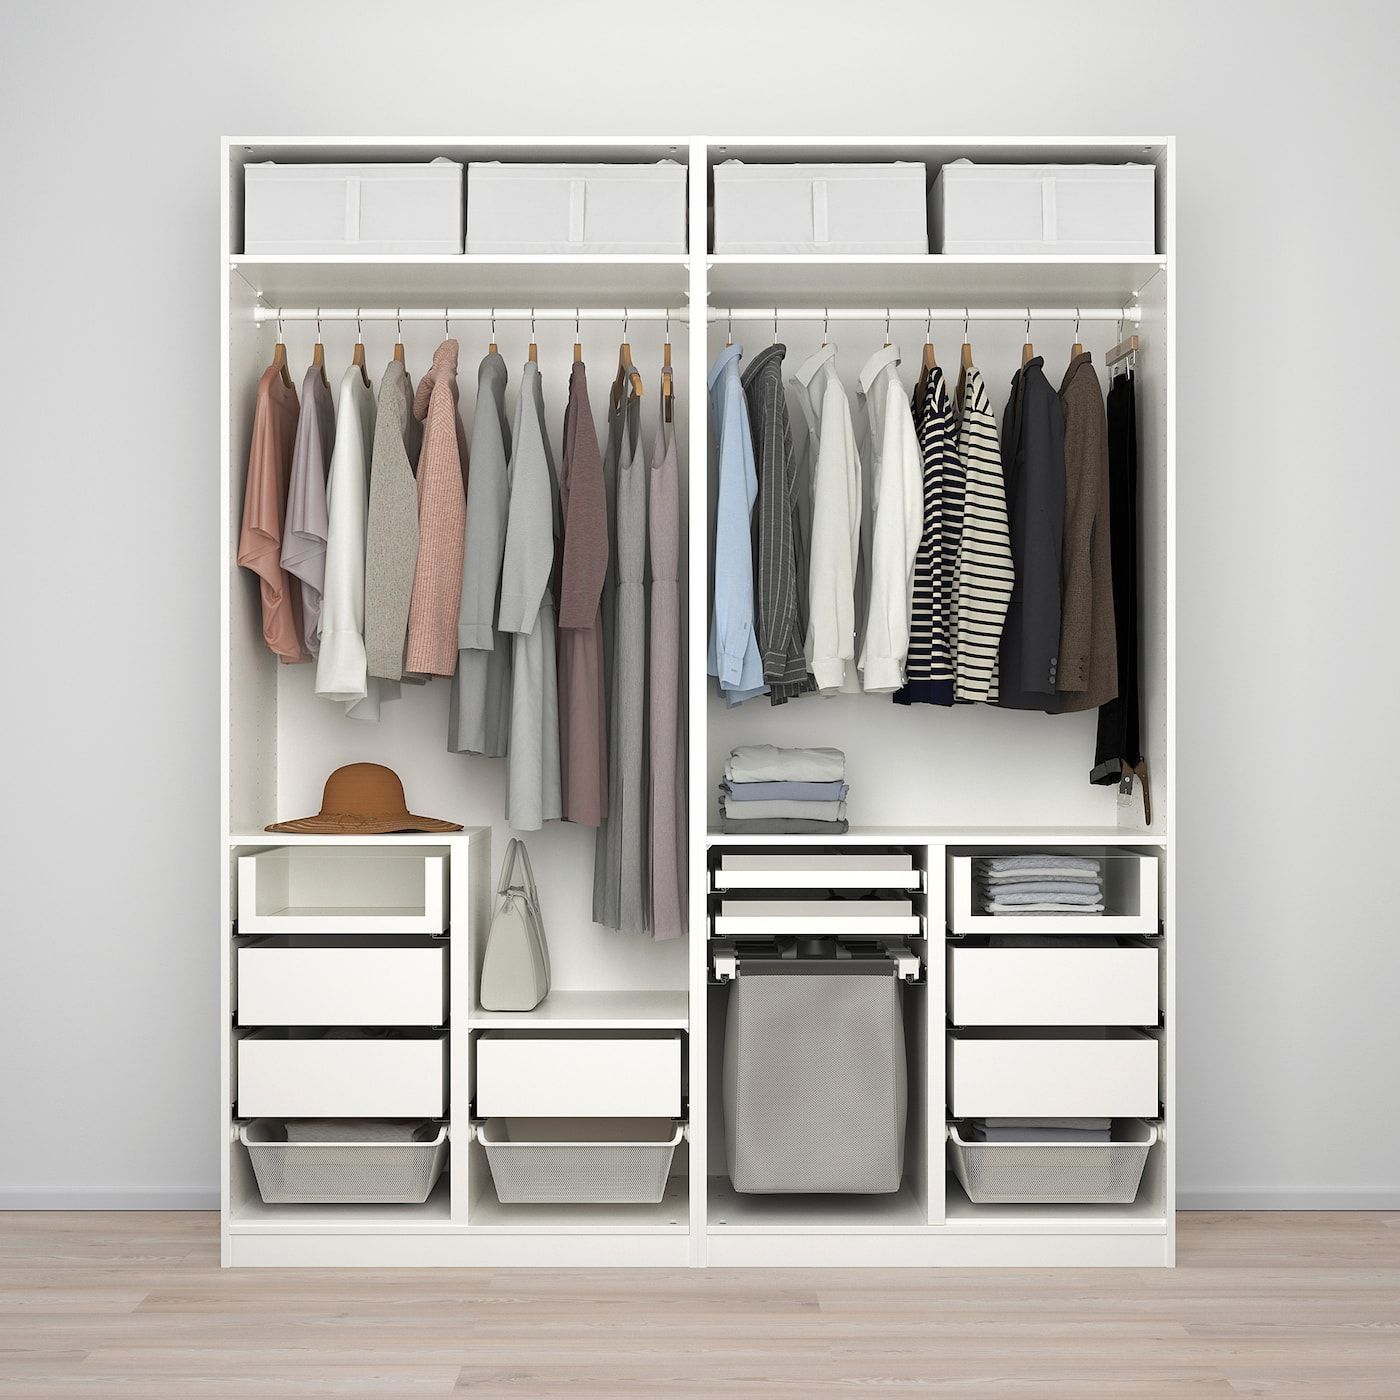 PAX Wardrobe white, Mehamn Sekken 78 3/4x26x93 1/8